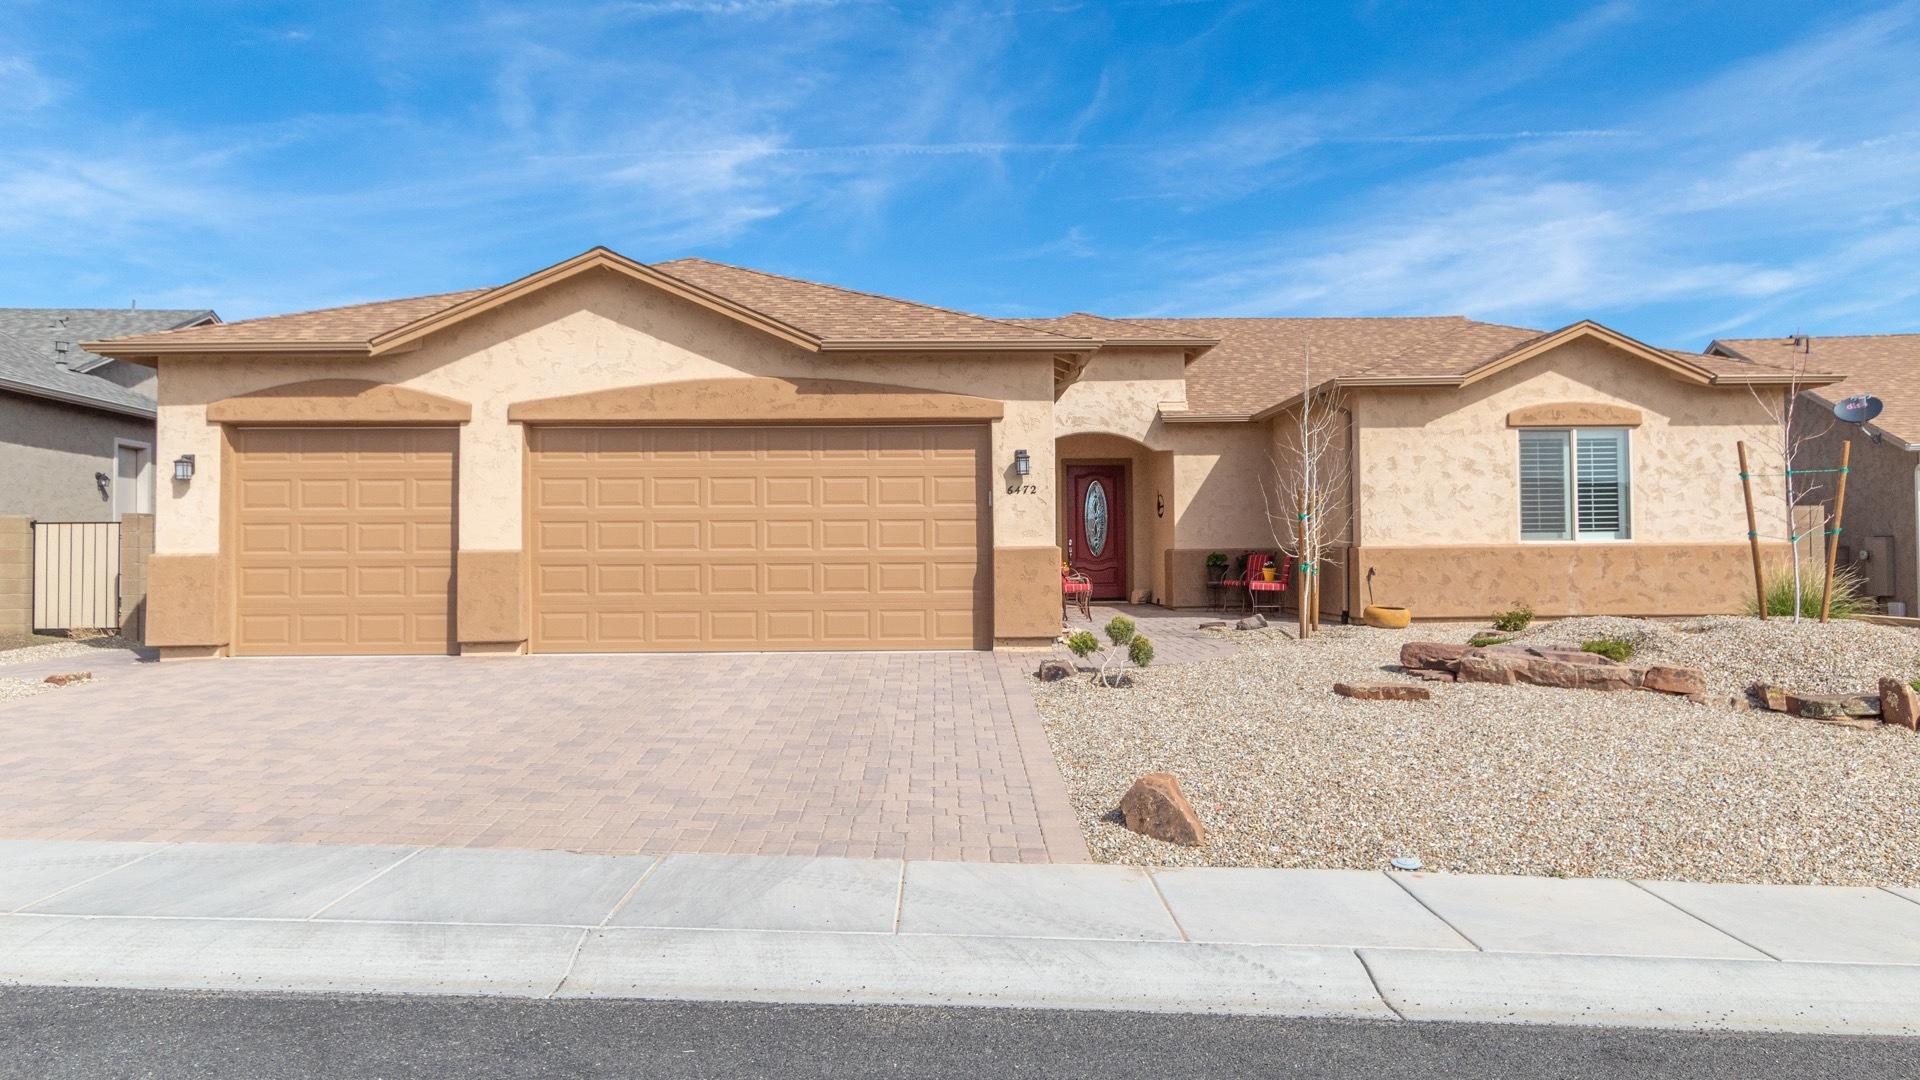 Photo of 6472 Alwick, Prescott Valley, AZ 86314